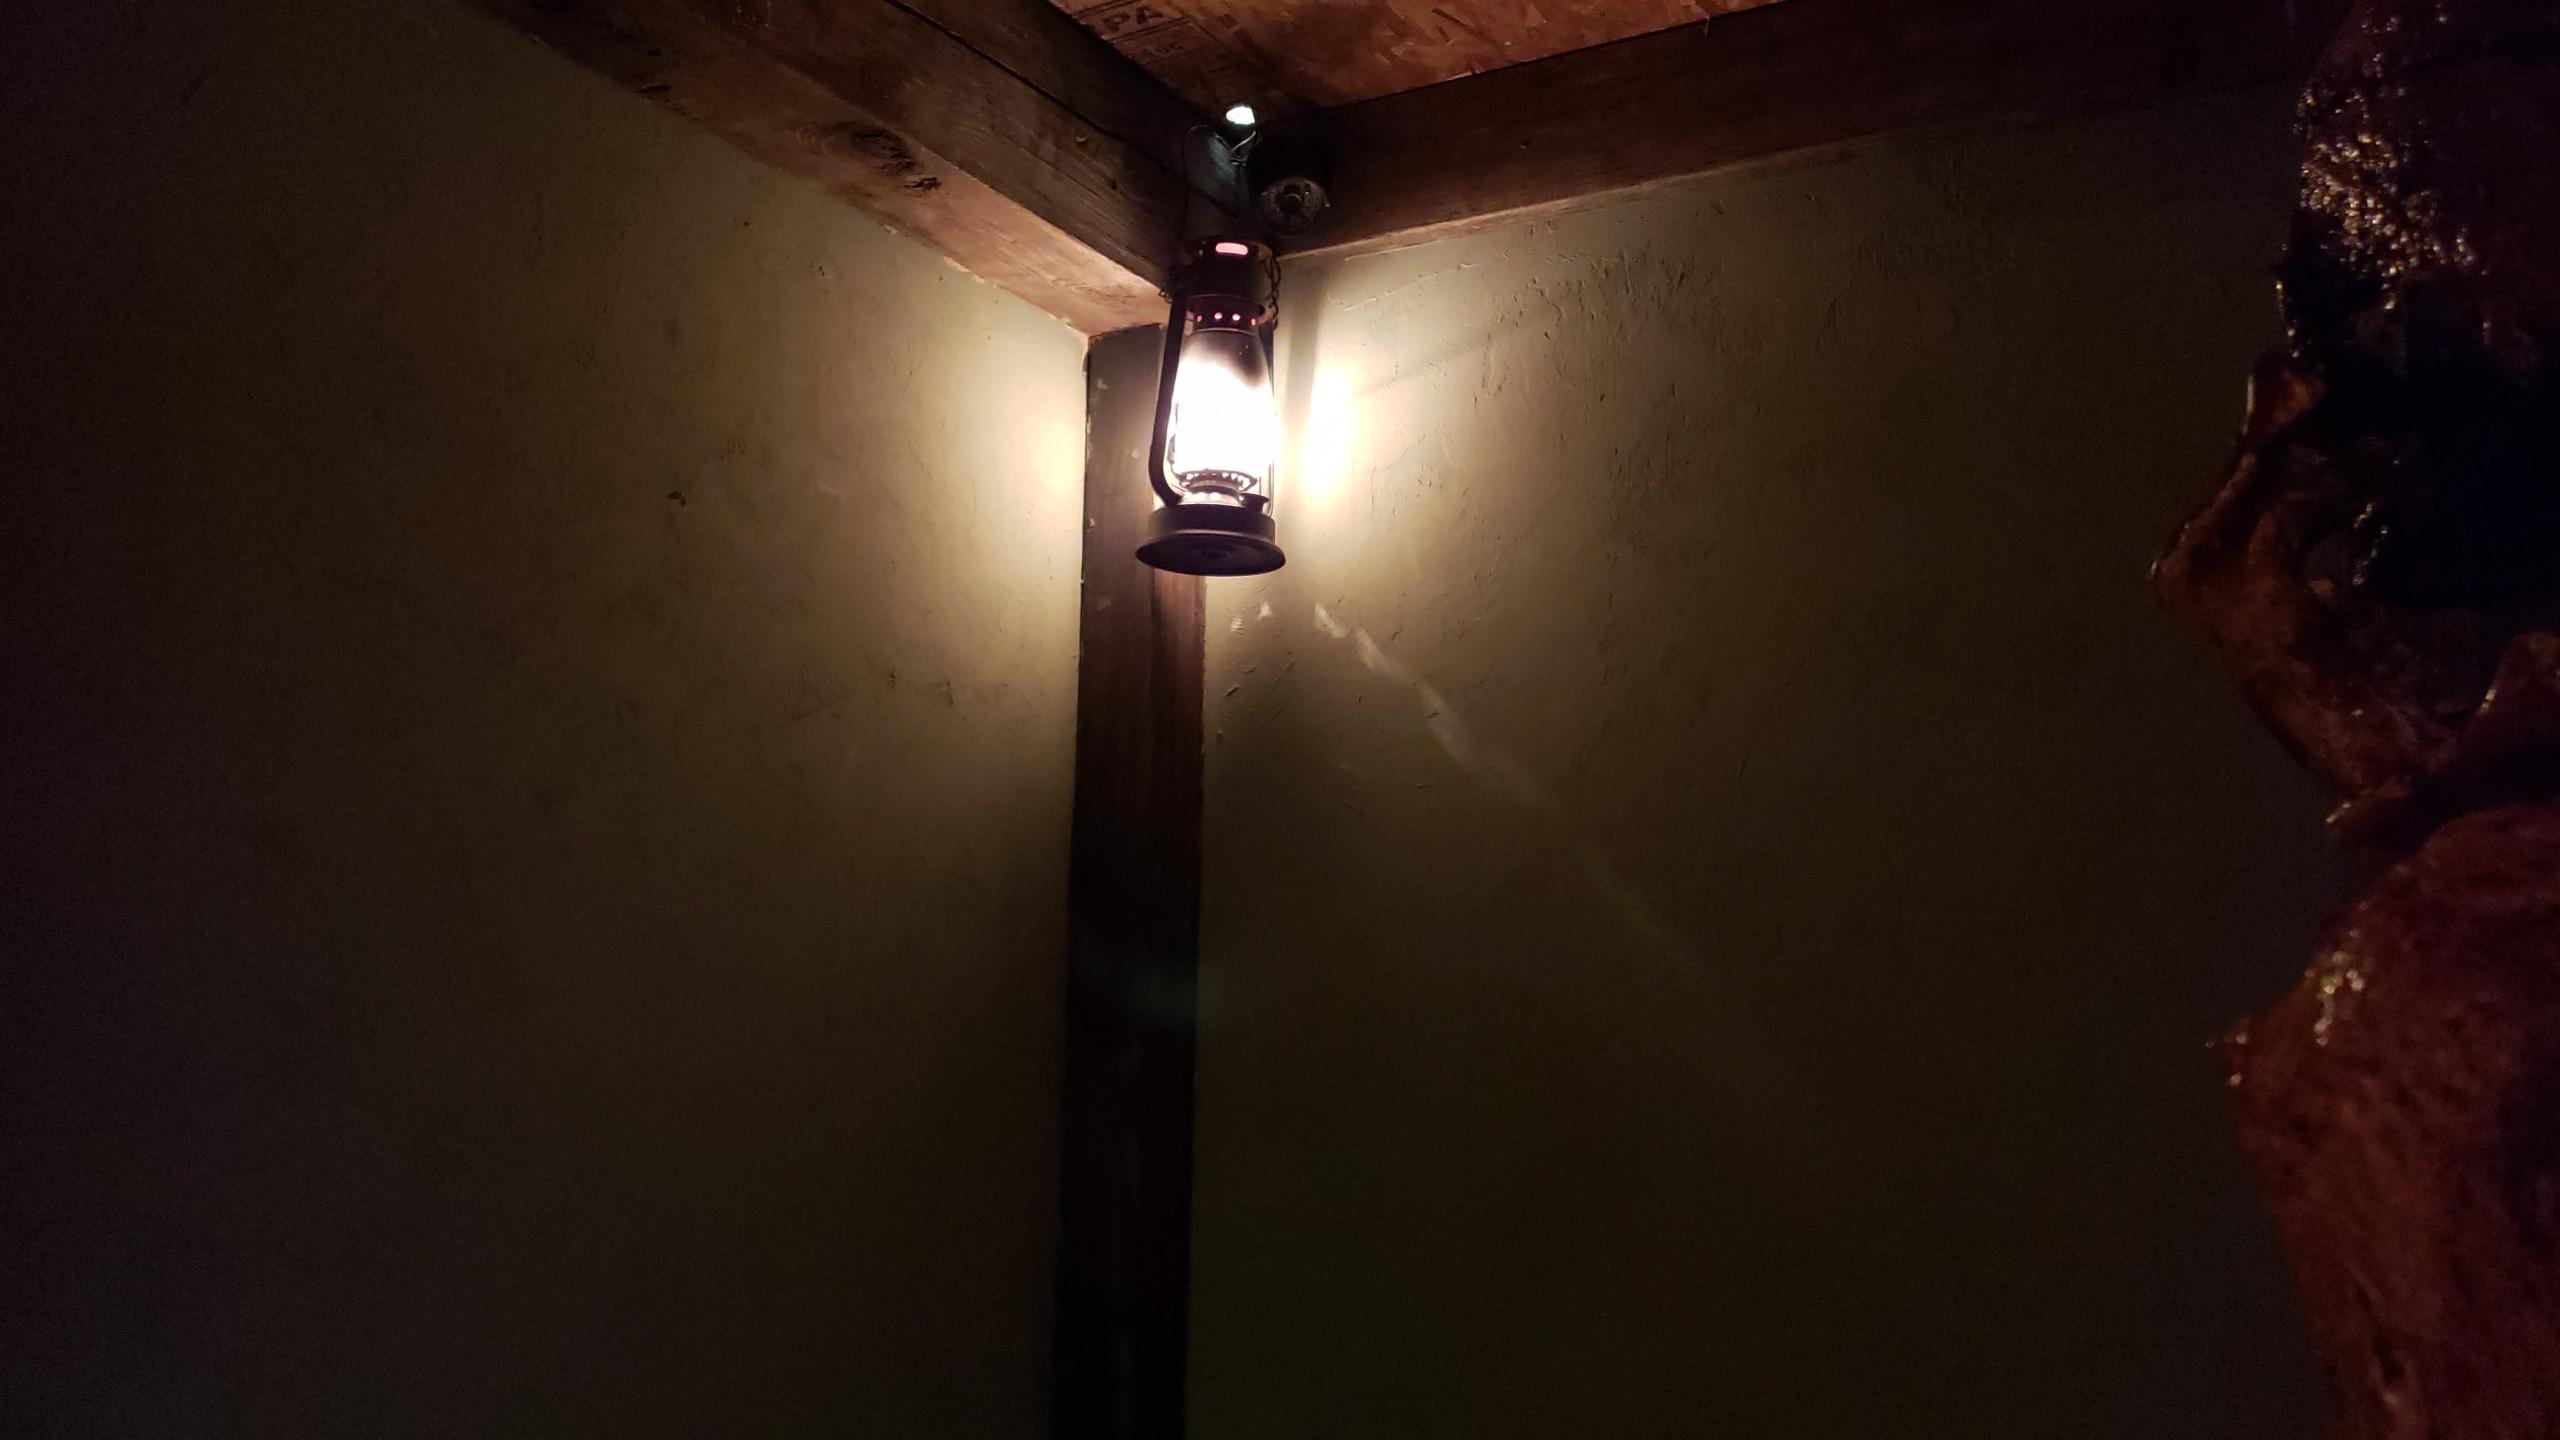 Actual Room Photo 1